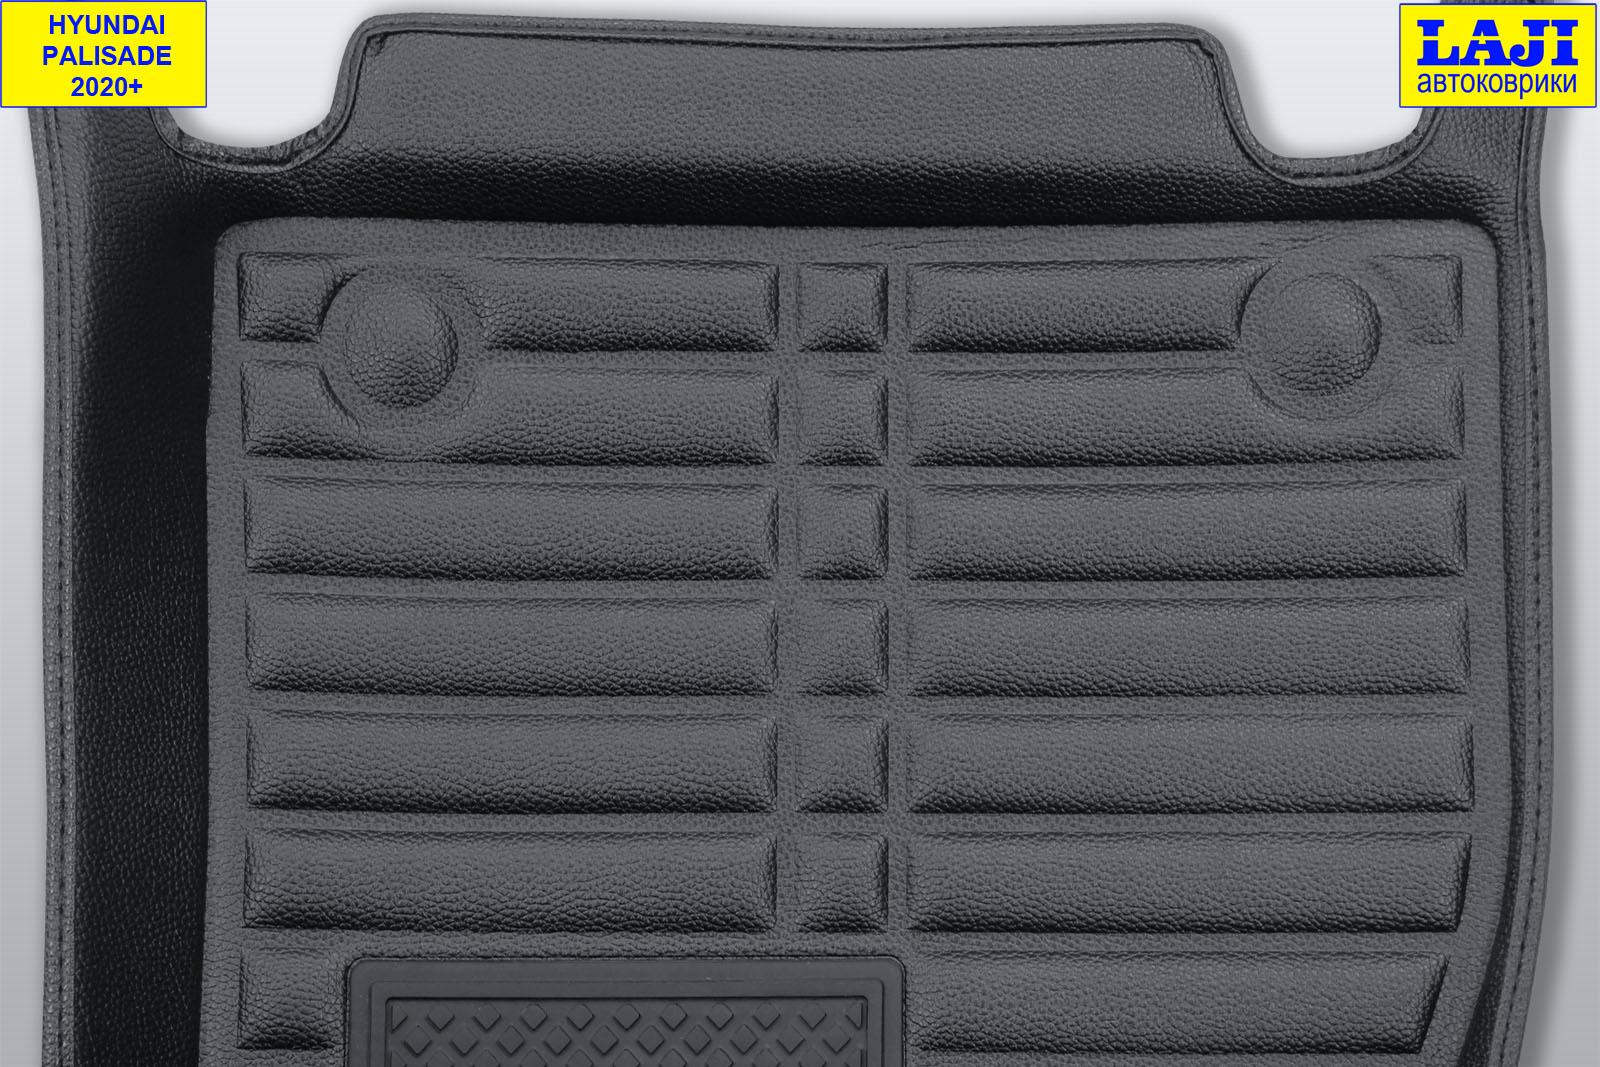 5D коврики в салон Hyundai Palisade 2020-н.в. 8